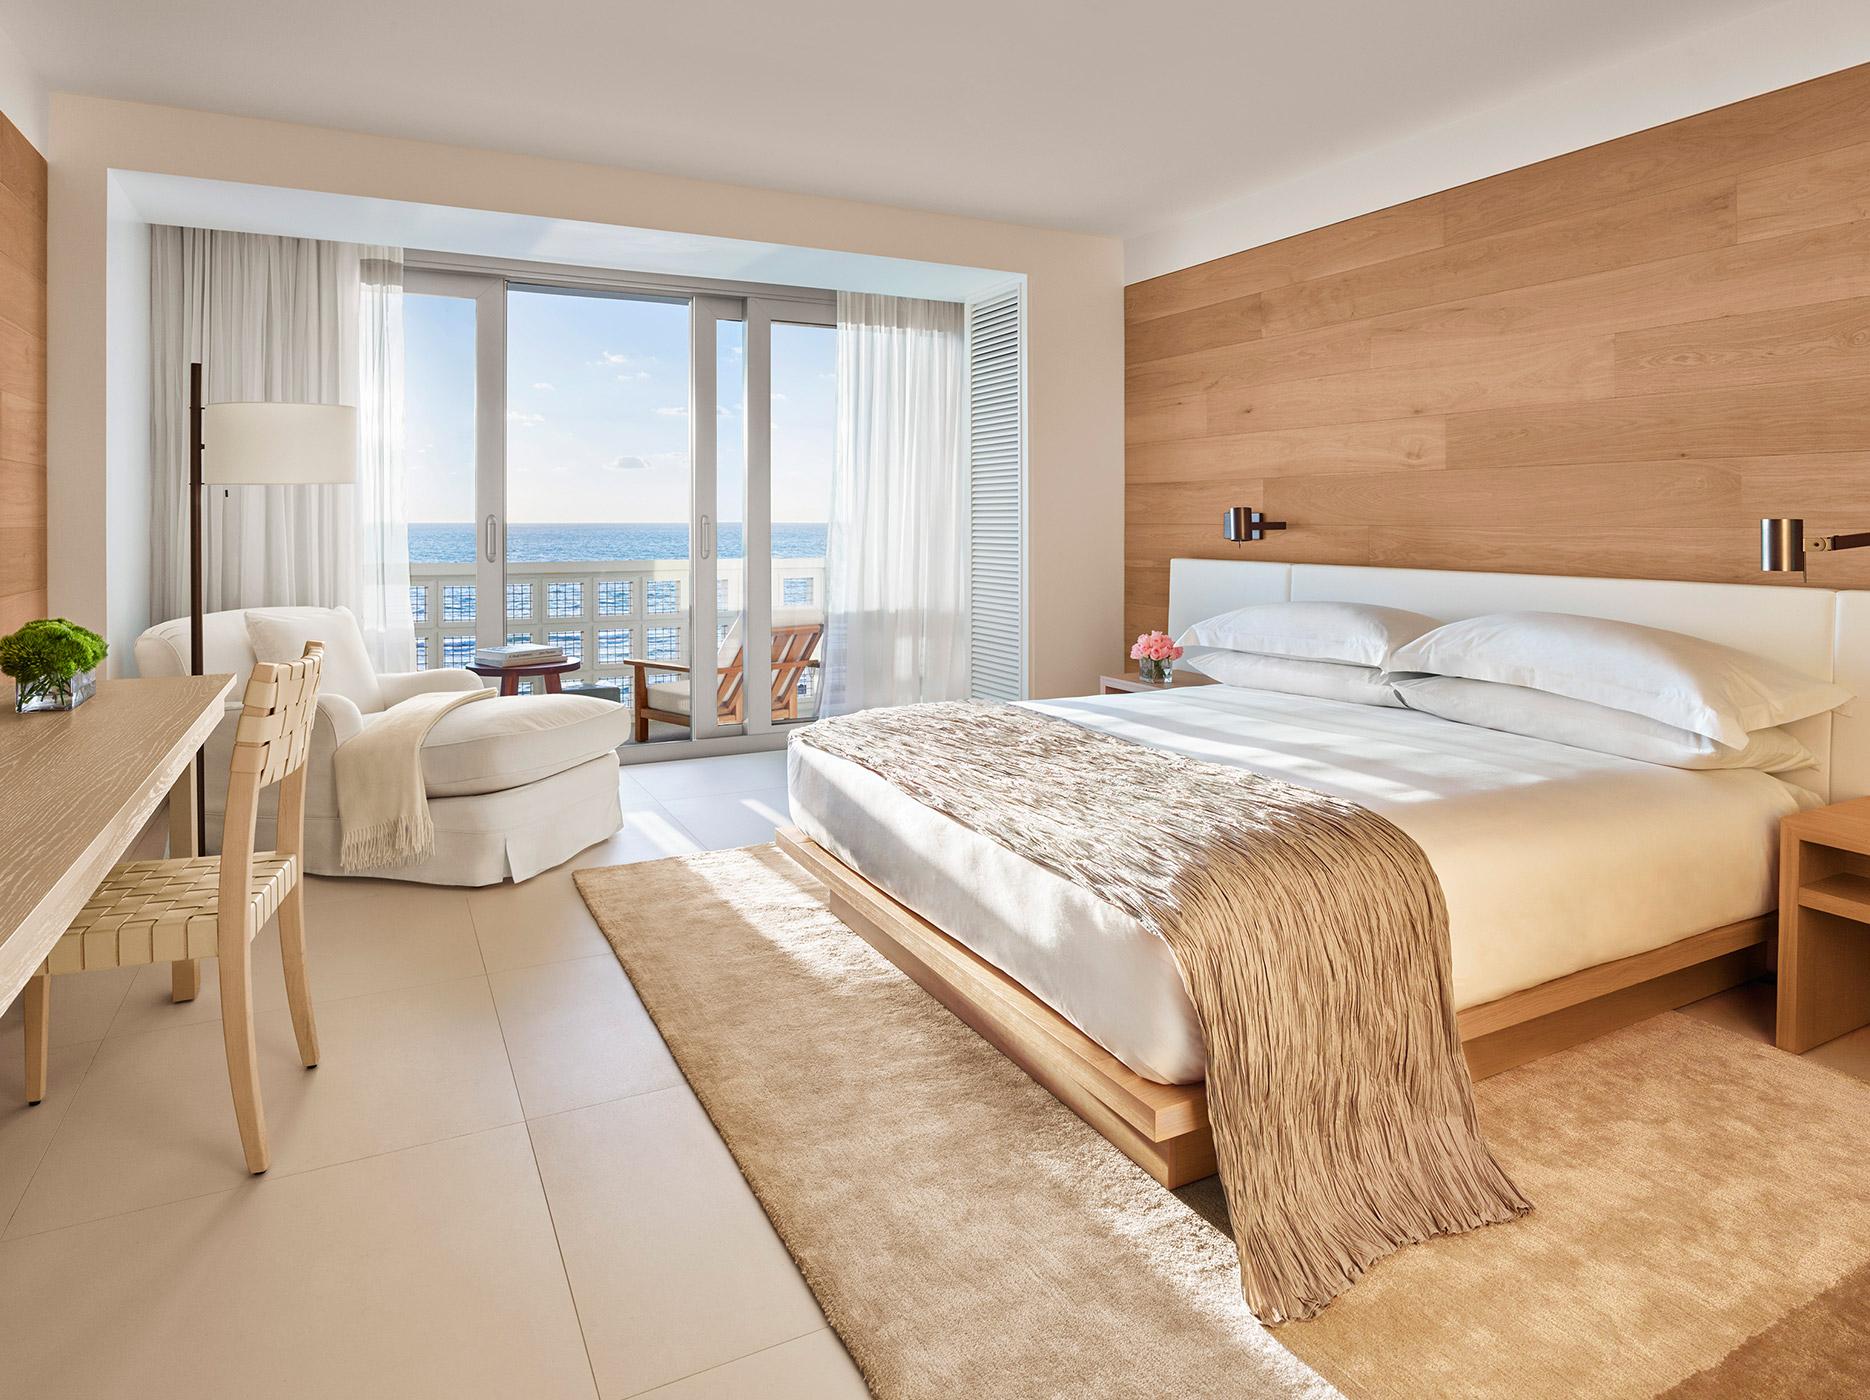 Edition Hotels - Unique luxury lifestyle hotel brand